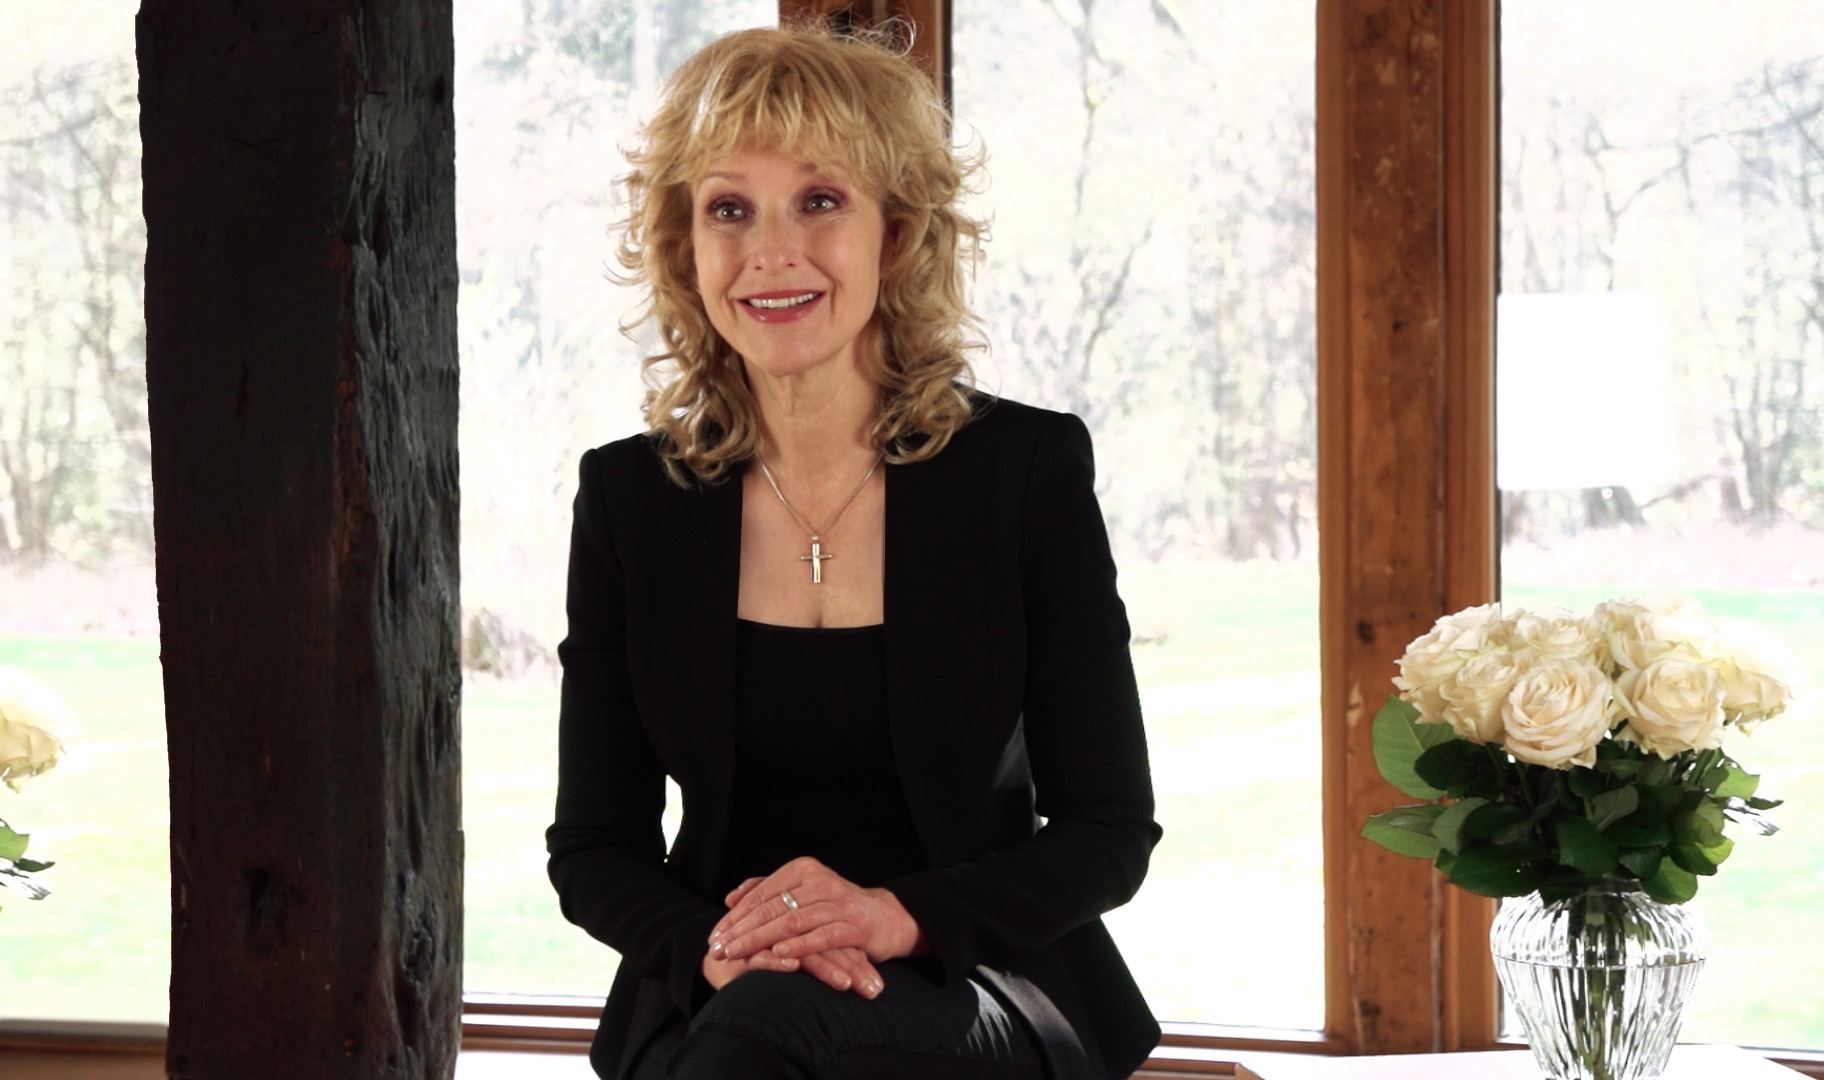 Rosemarie Seibel